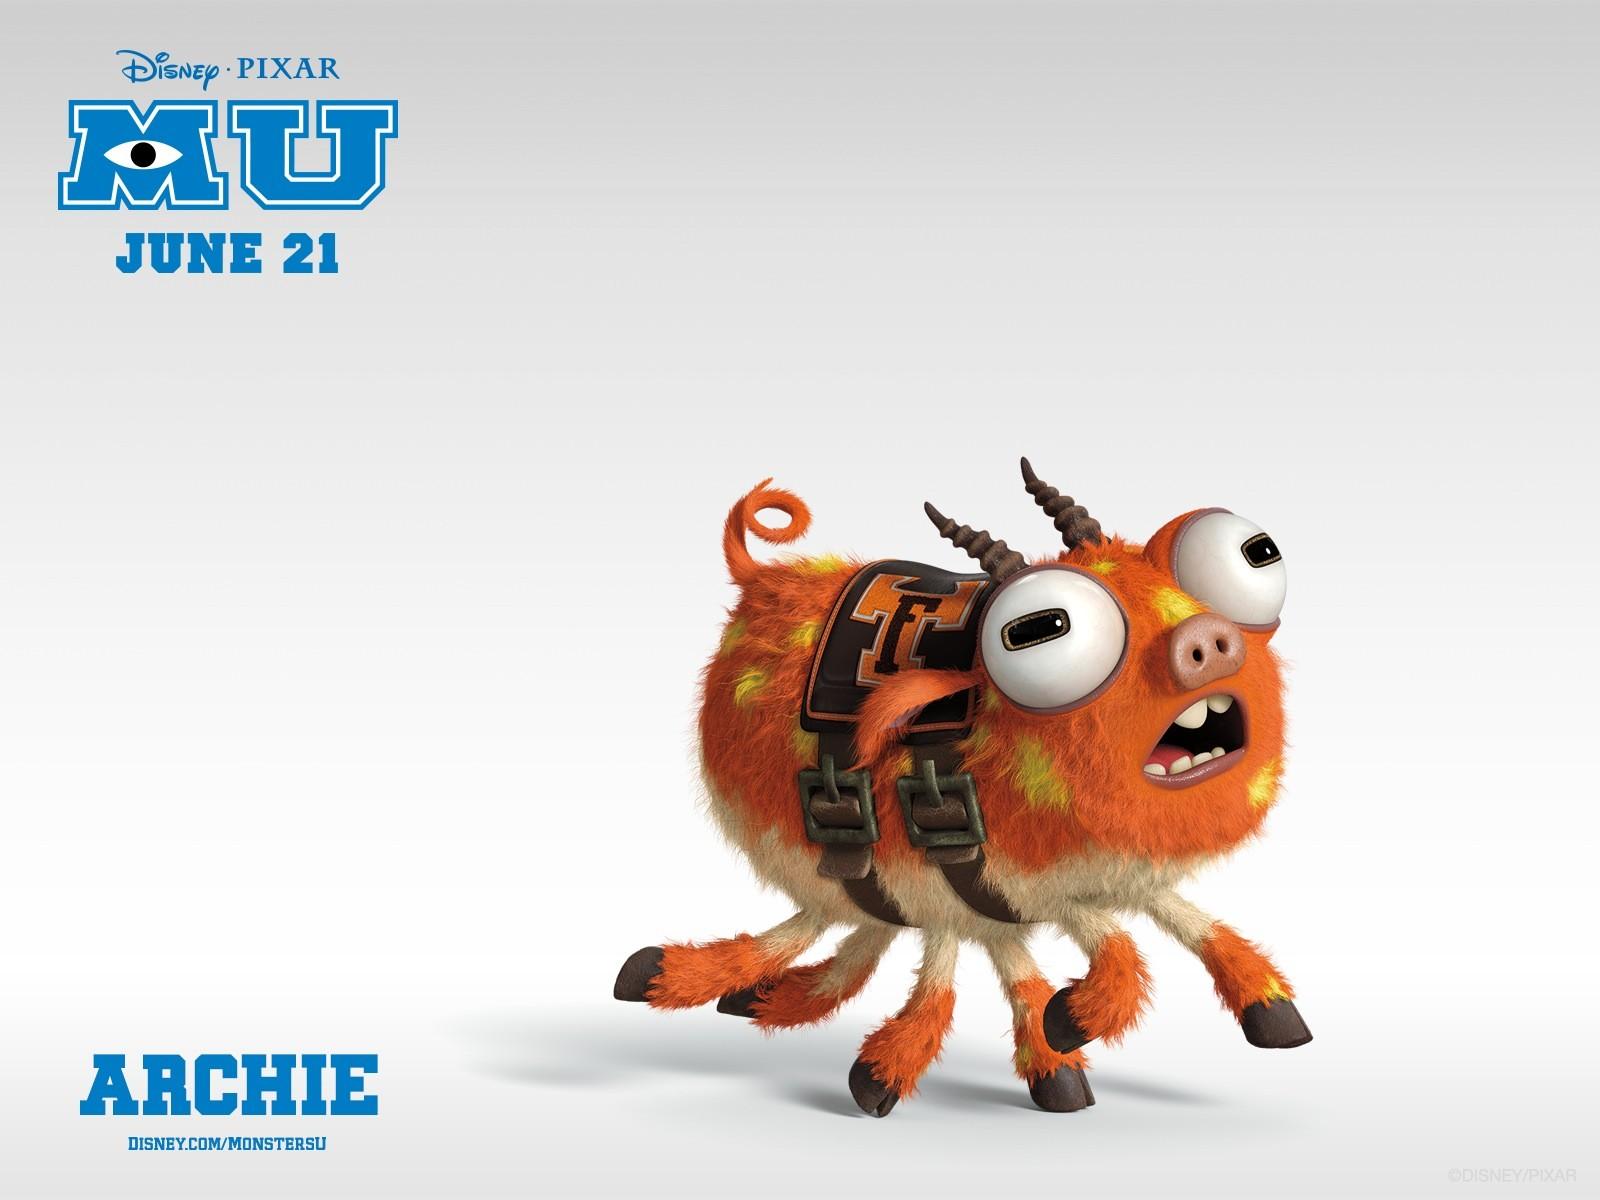 Archie Monsters University HD Wallpaper - Archie Monsters University HD Wallpaper